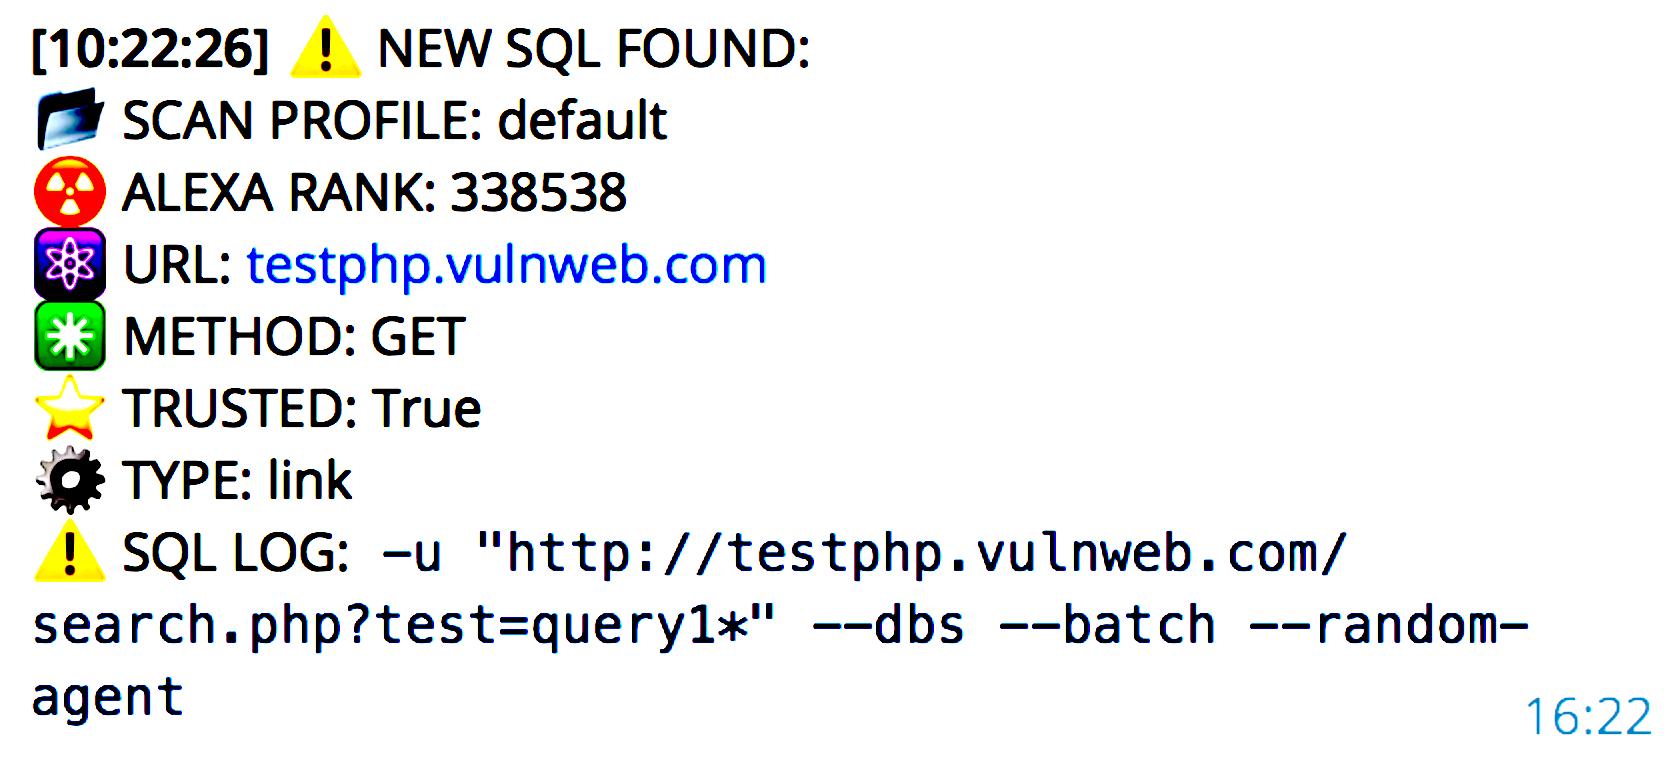 «Хакерский» сканер для поиска уязвимостей доступен в даркнете за 0